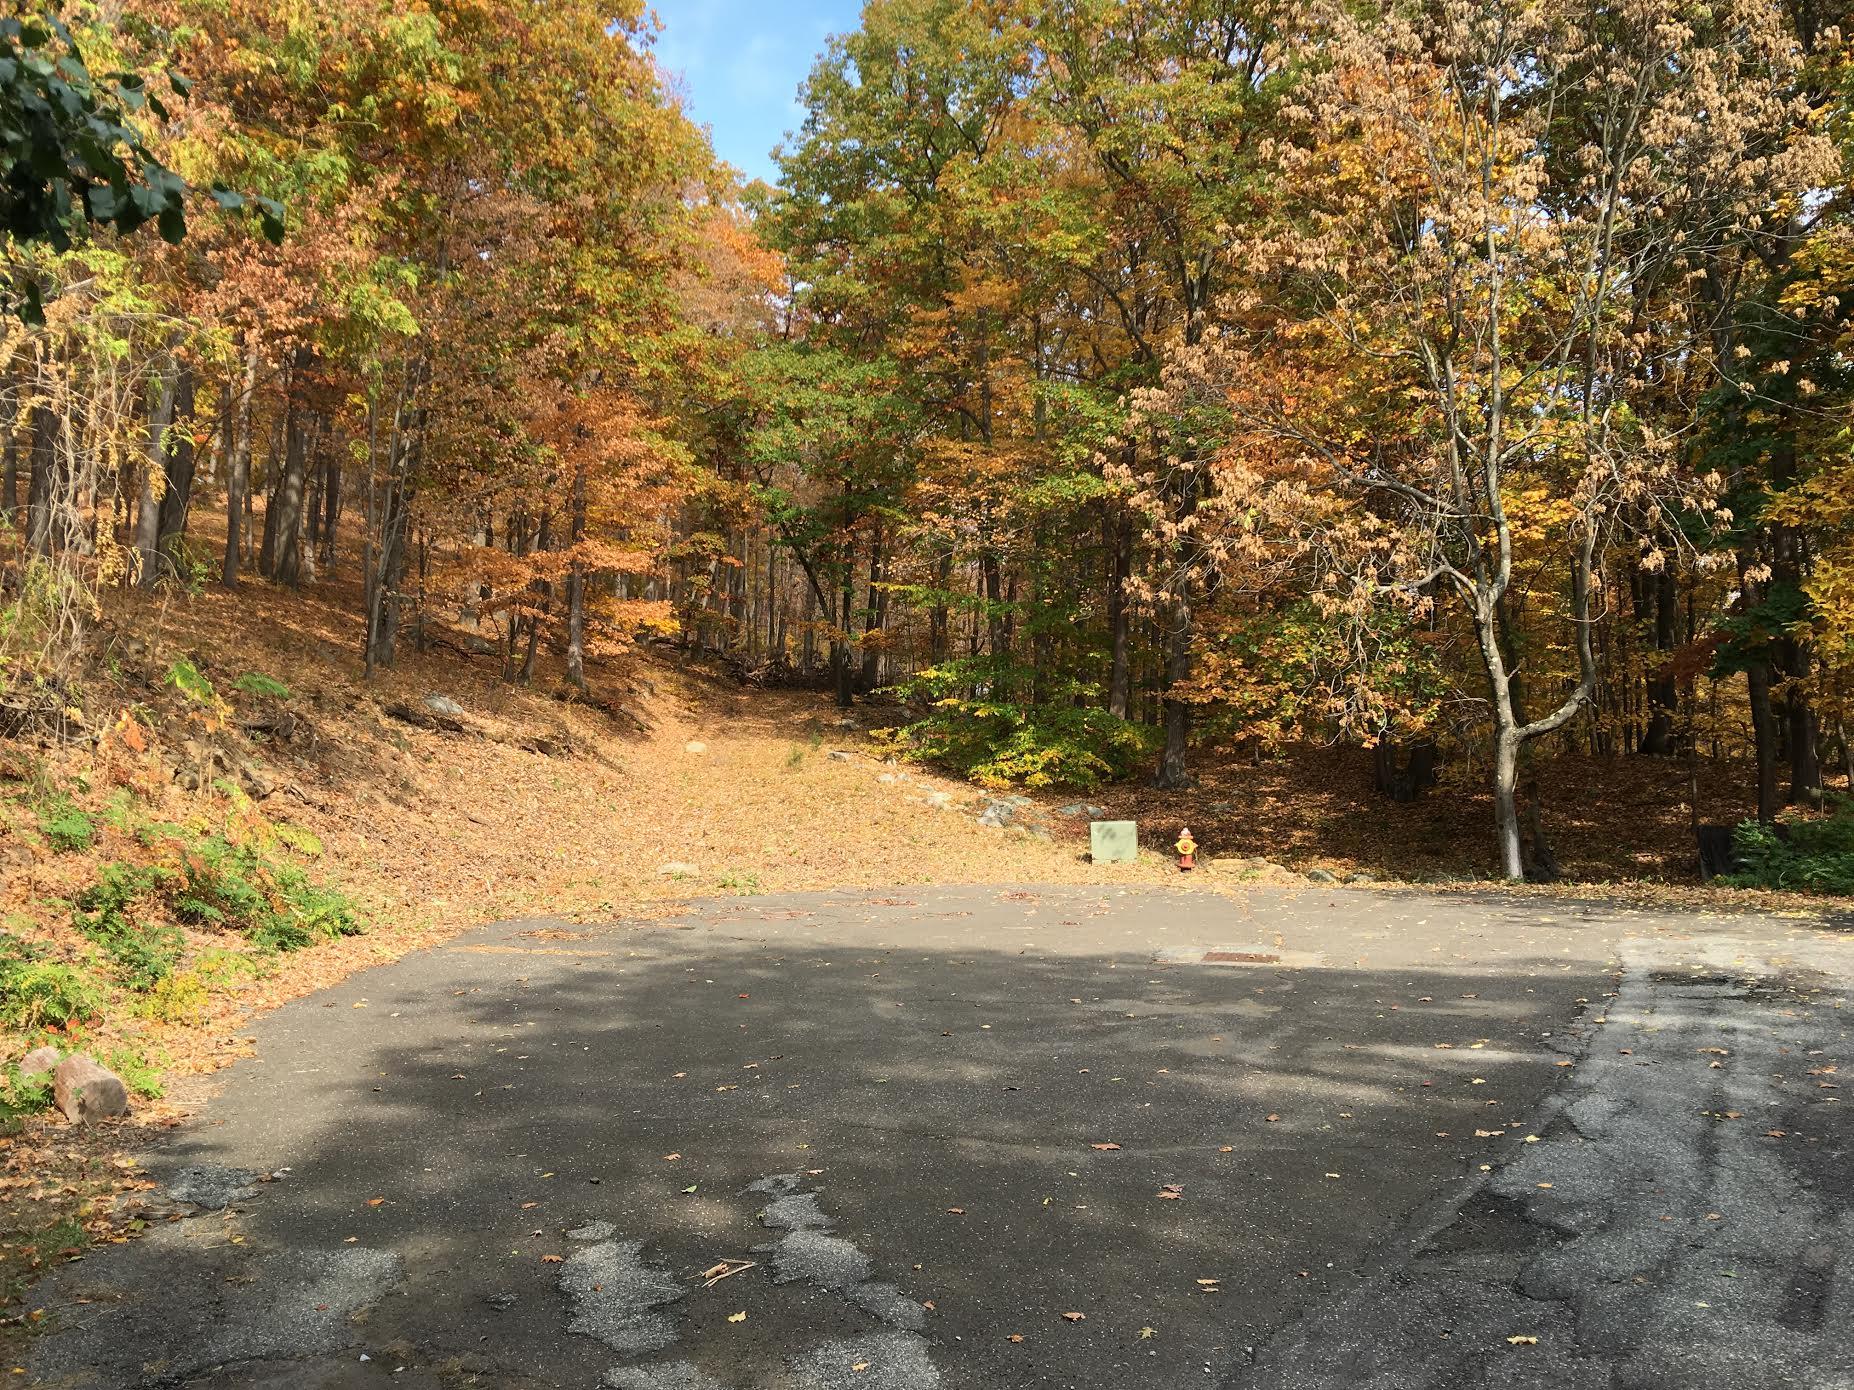 土地 为 销售 在 Beautiful Land in Historic District Lookout Stable Road 德克斯朵公园, 纽约州, 10987 美国